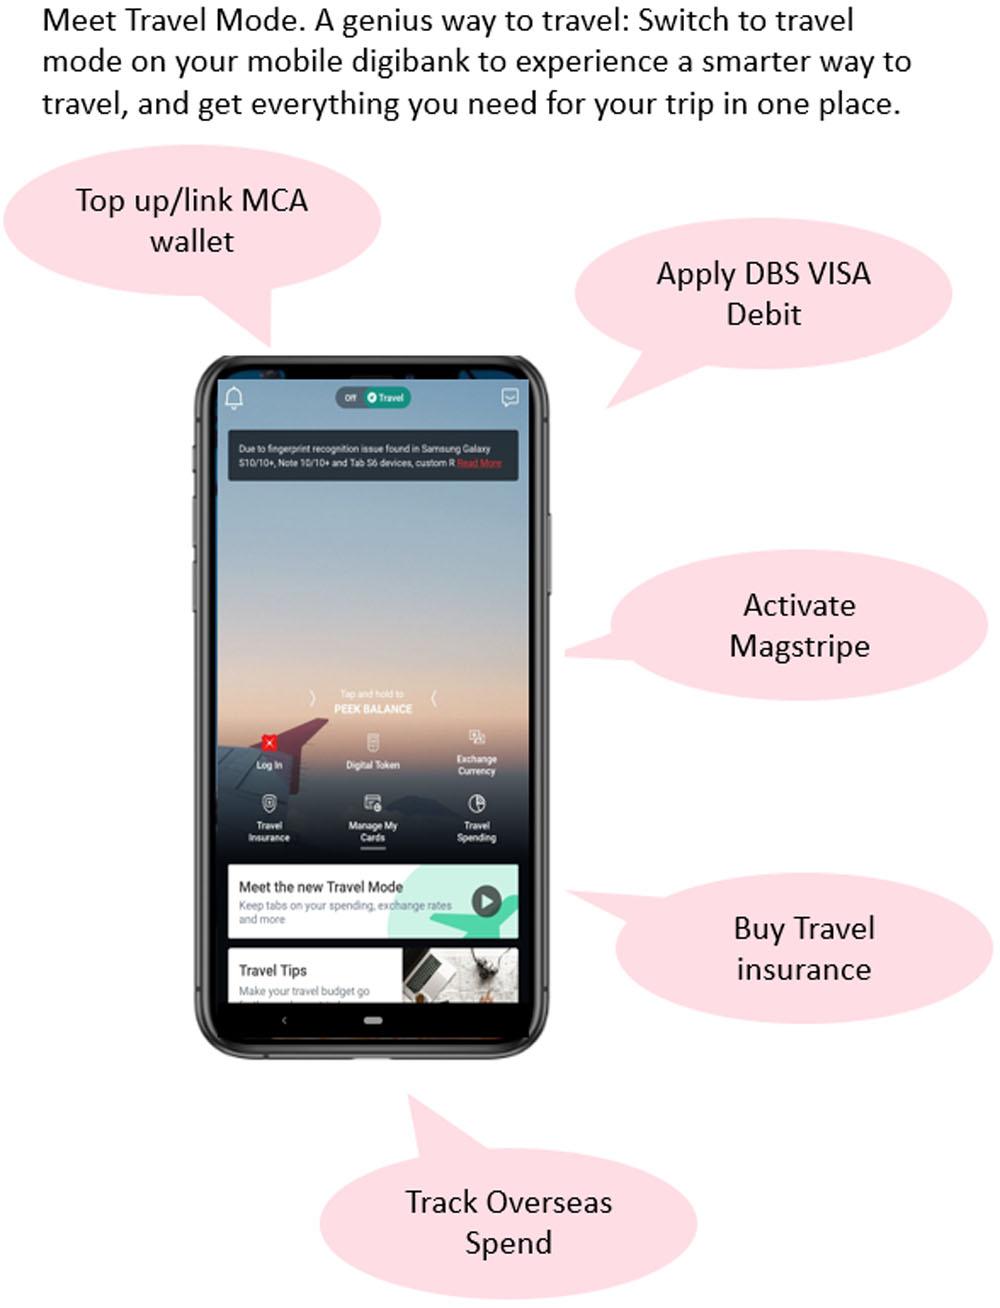 DBS Travel Marketplace